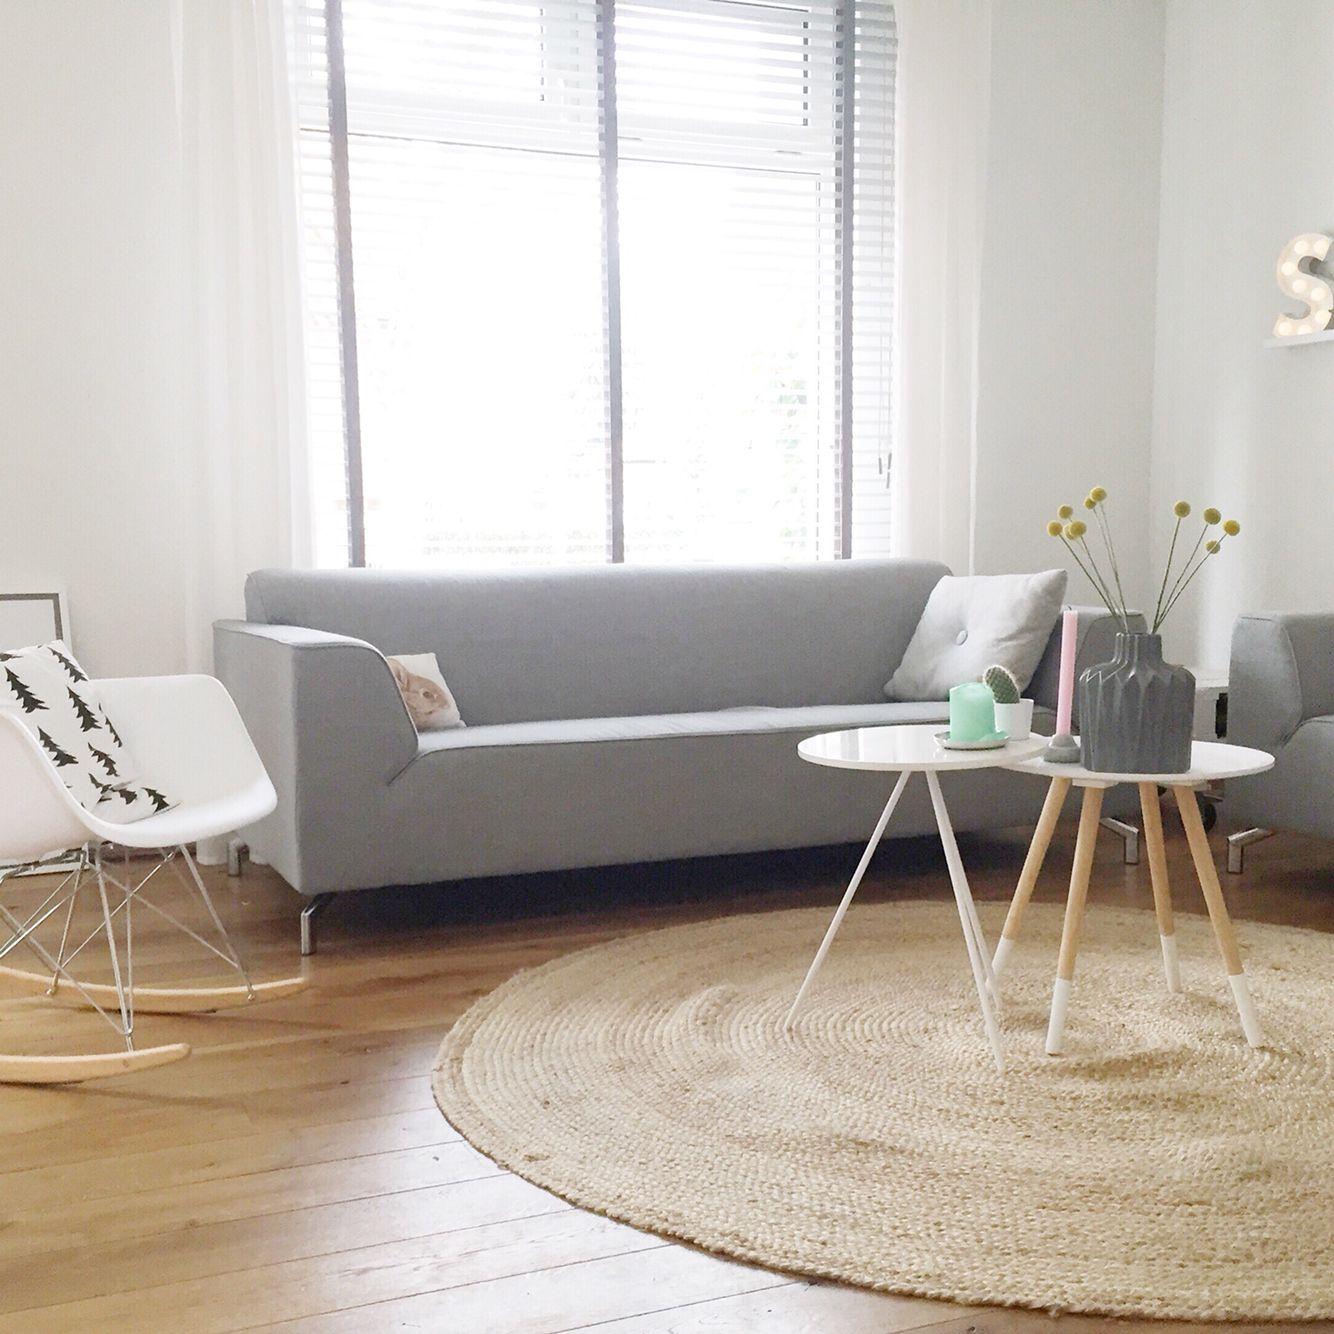 Woonkamer grijze bank wit licht zuiver | Living | Pinterest | Banks ...